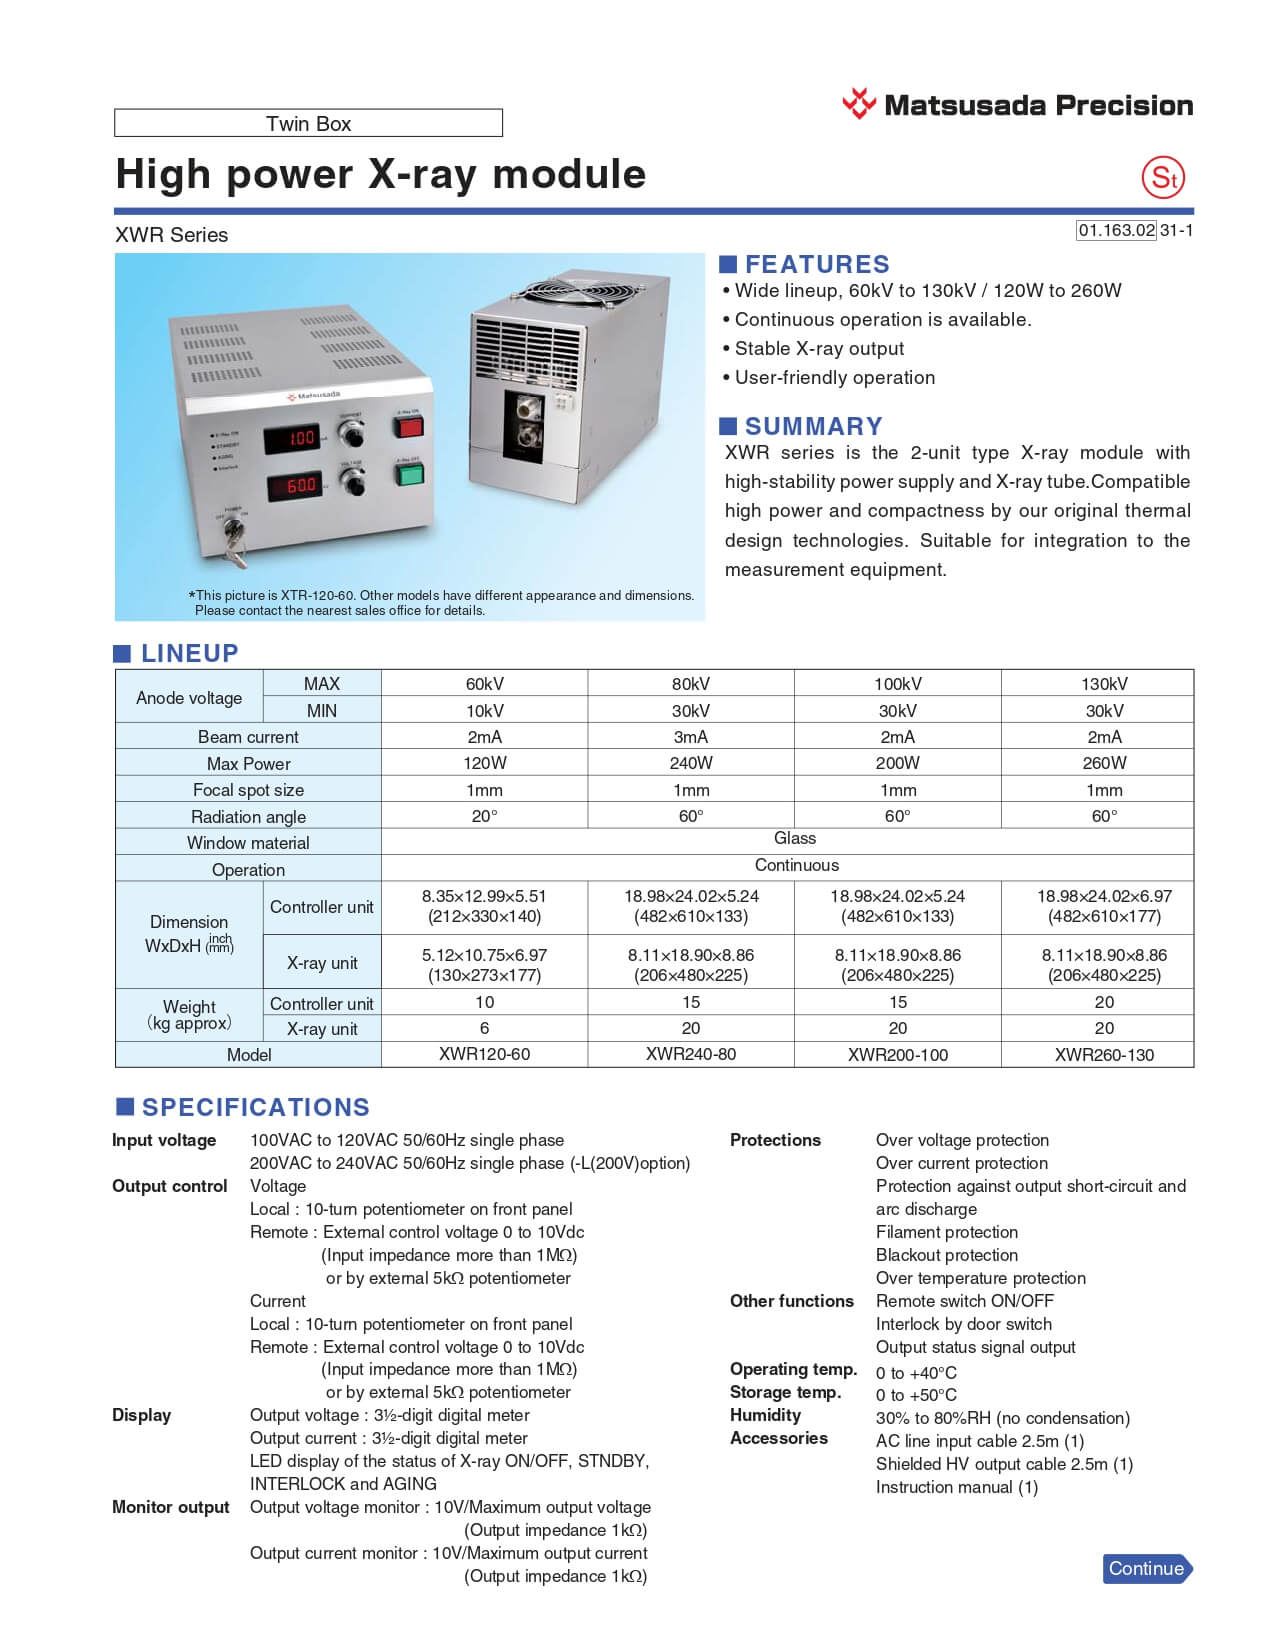 XWR series Datasheet